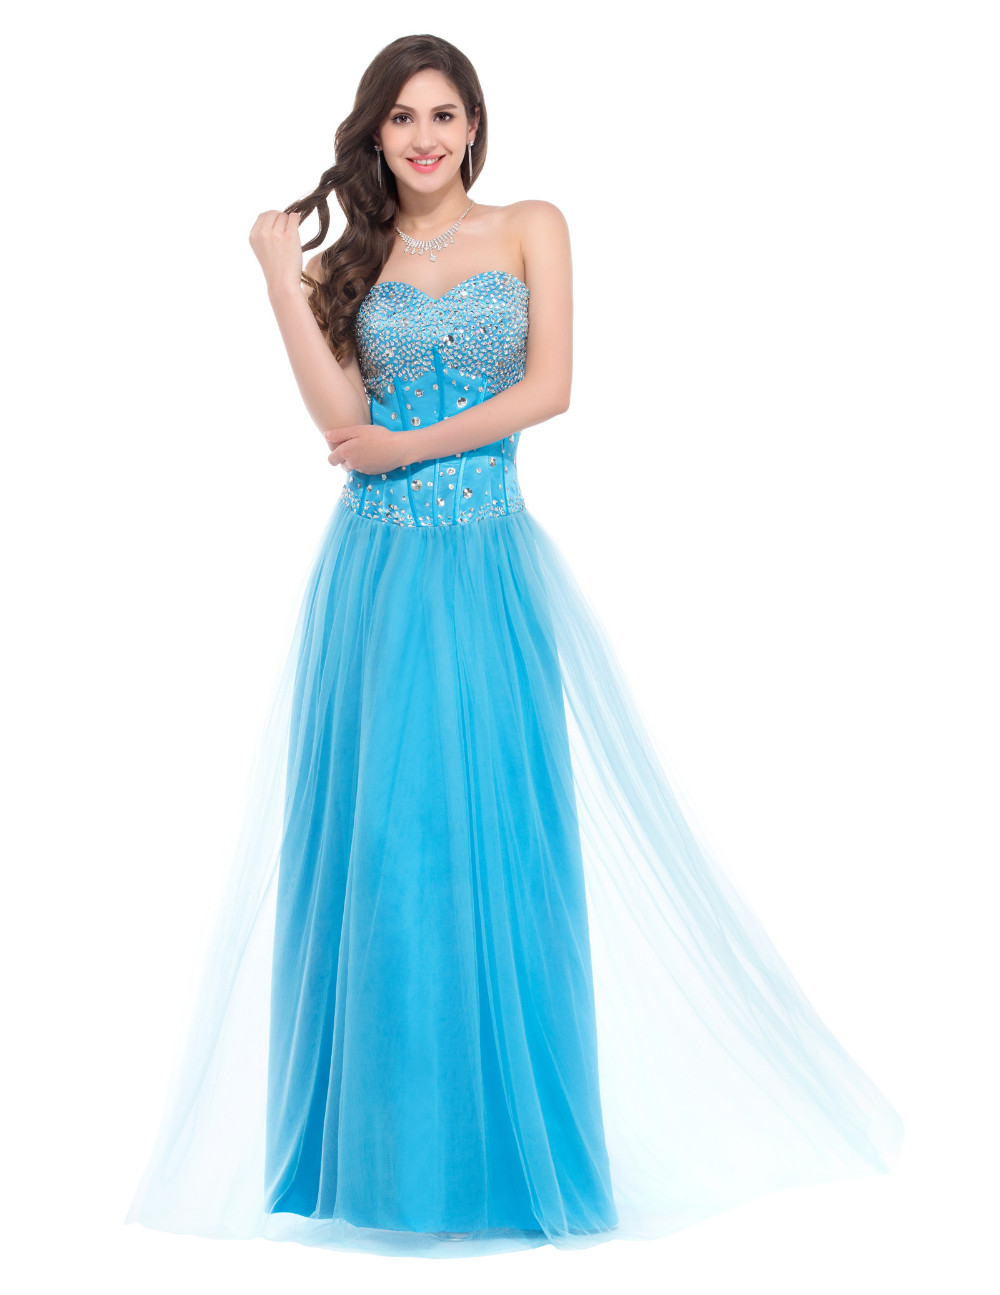 ≧Long Evening Dresses 2018 Grace Karin White Blue Pink Women Corset ...